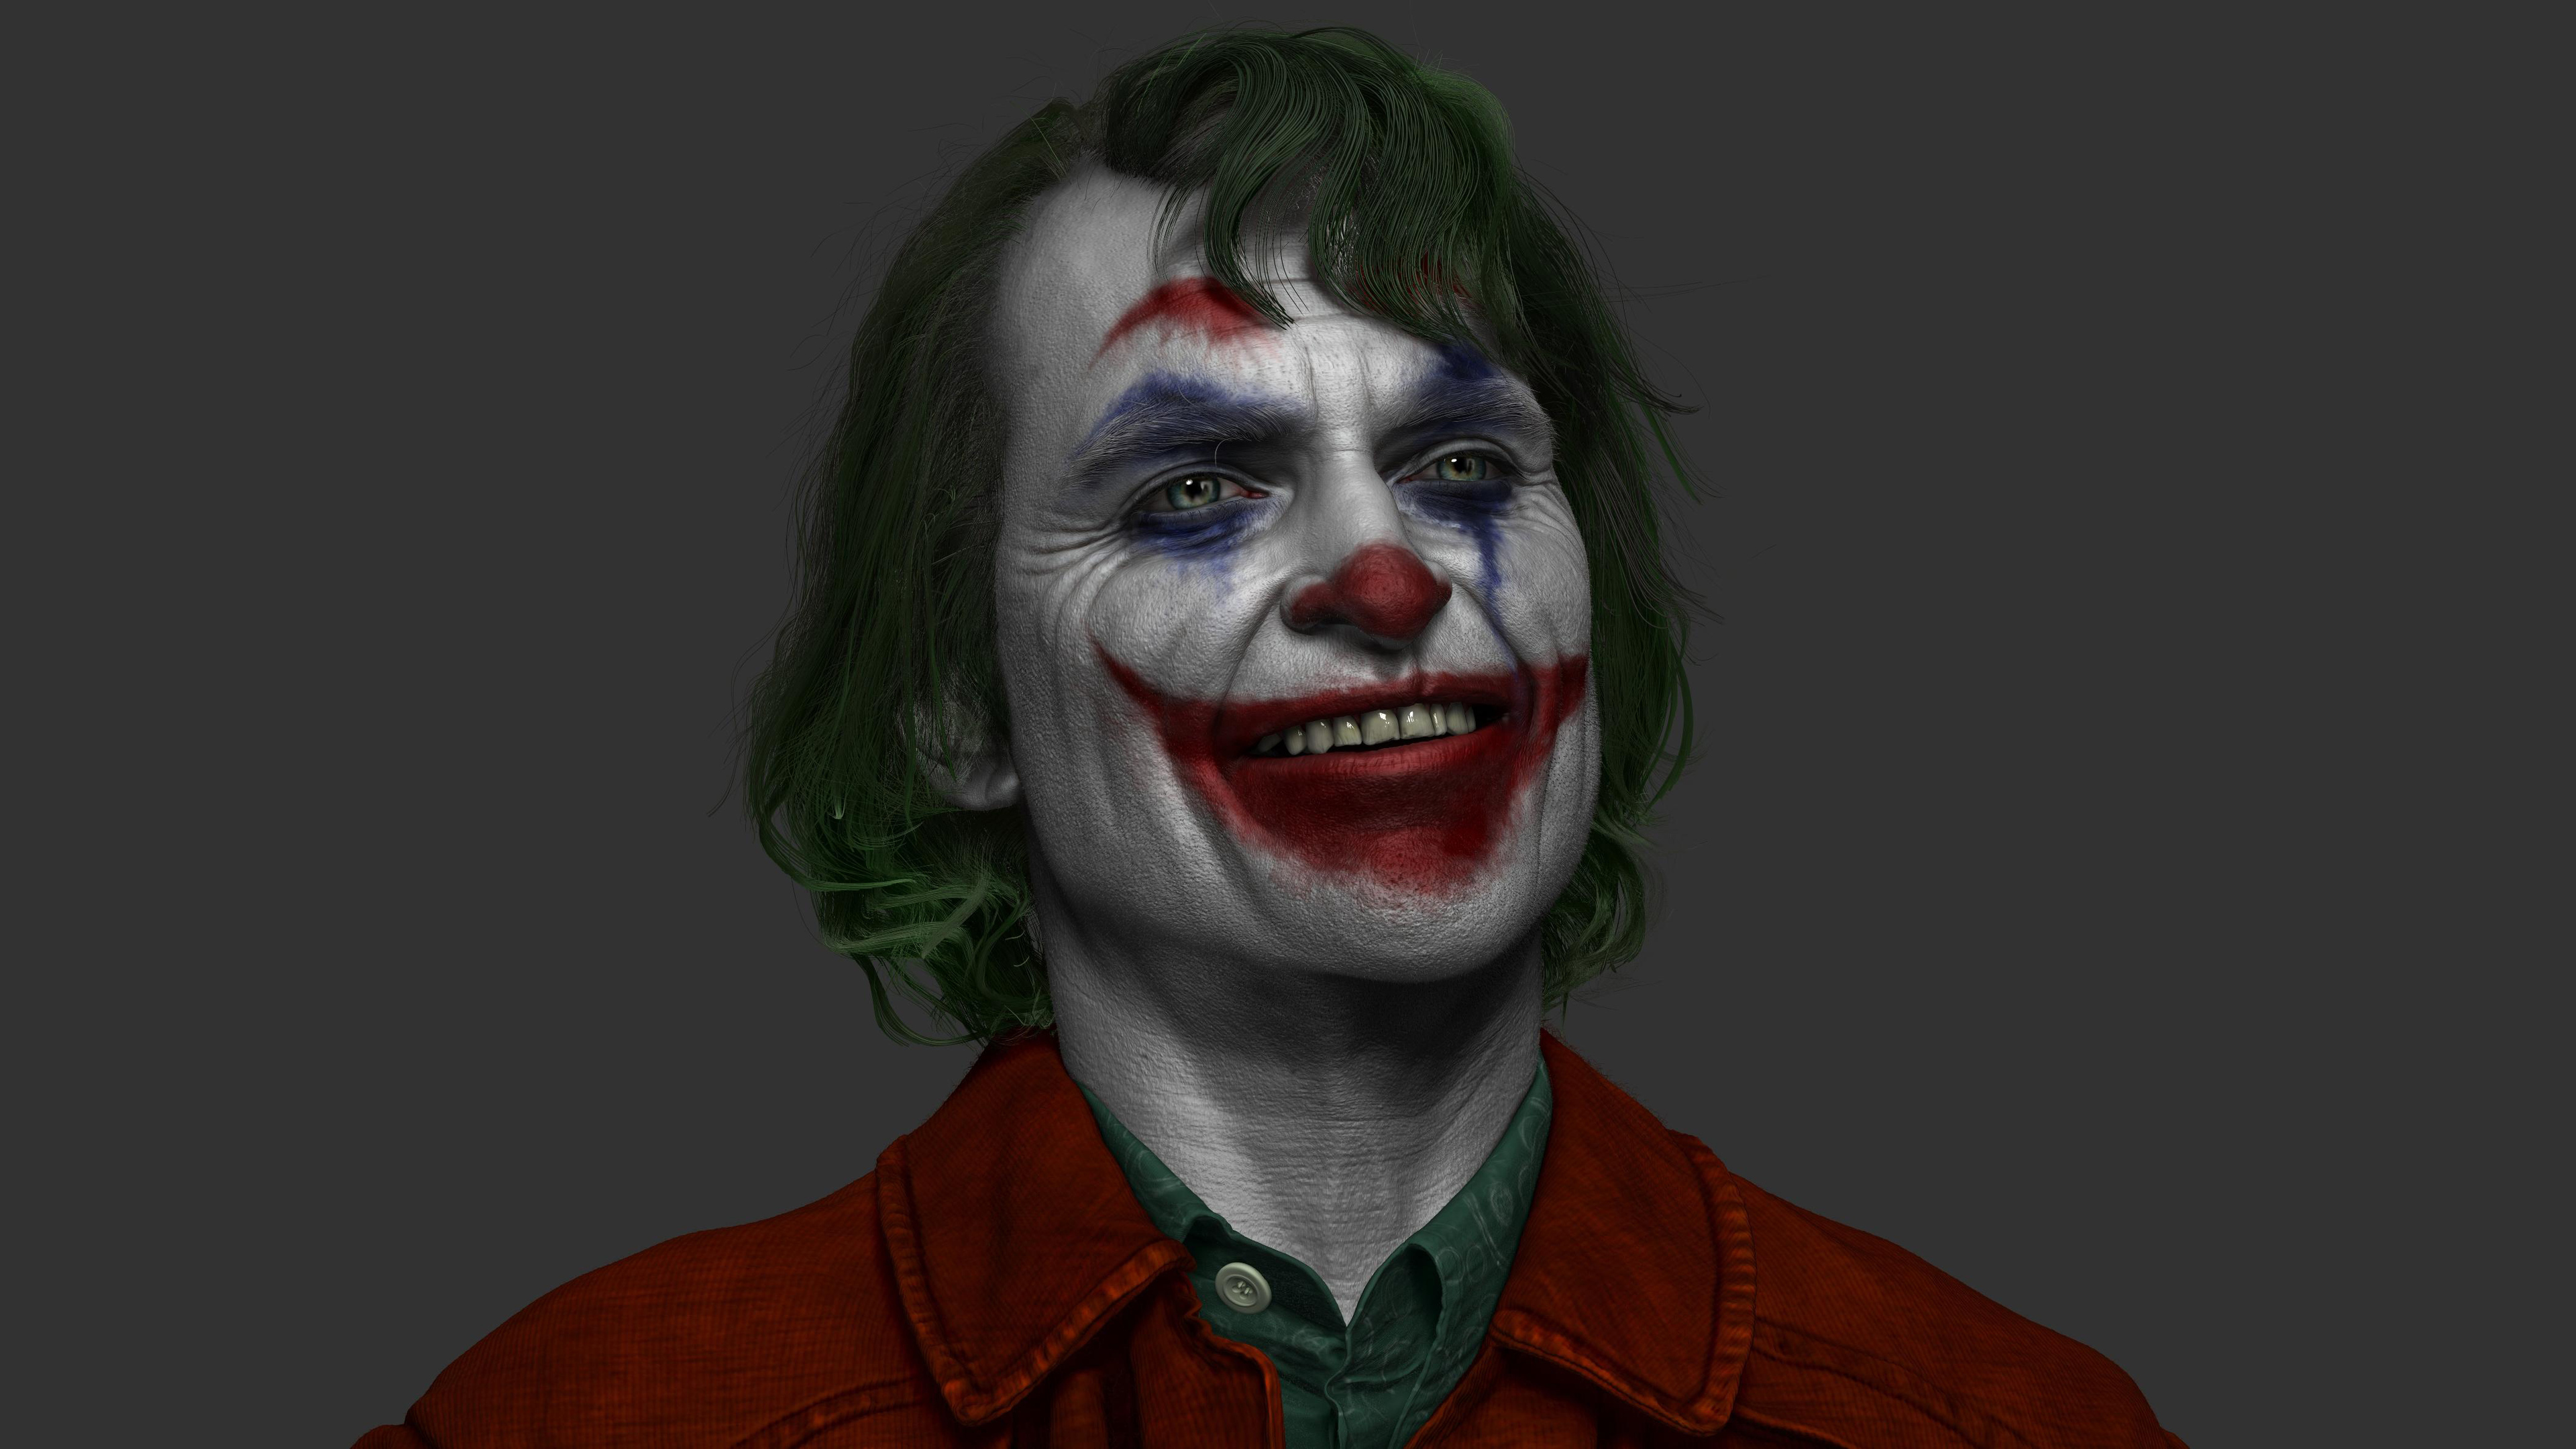 Wallpaper 4k Joker Joaquin Phoenix Artwork 4k 4k Wallpapers Artwork